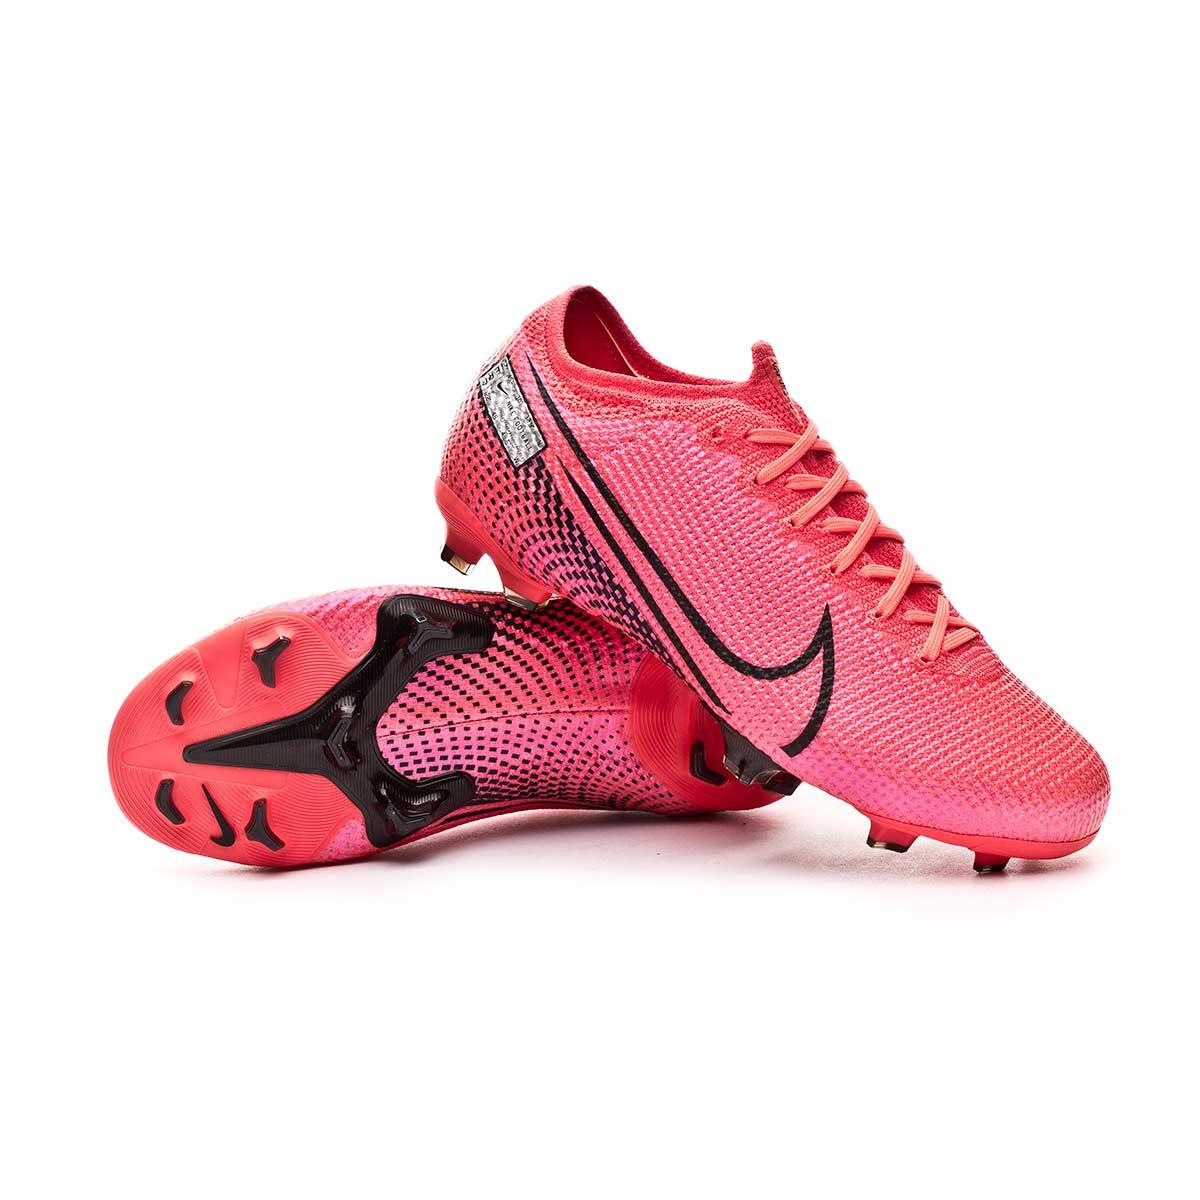 Cheap Nike Vapor 13 Cleats, Fake Nike Mercurial Vapor 13 Boots Sale